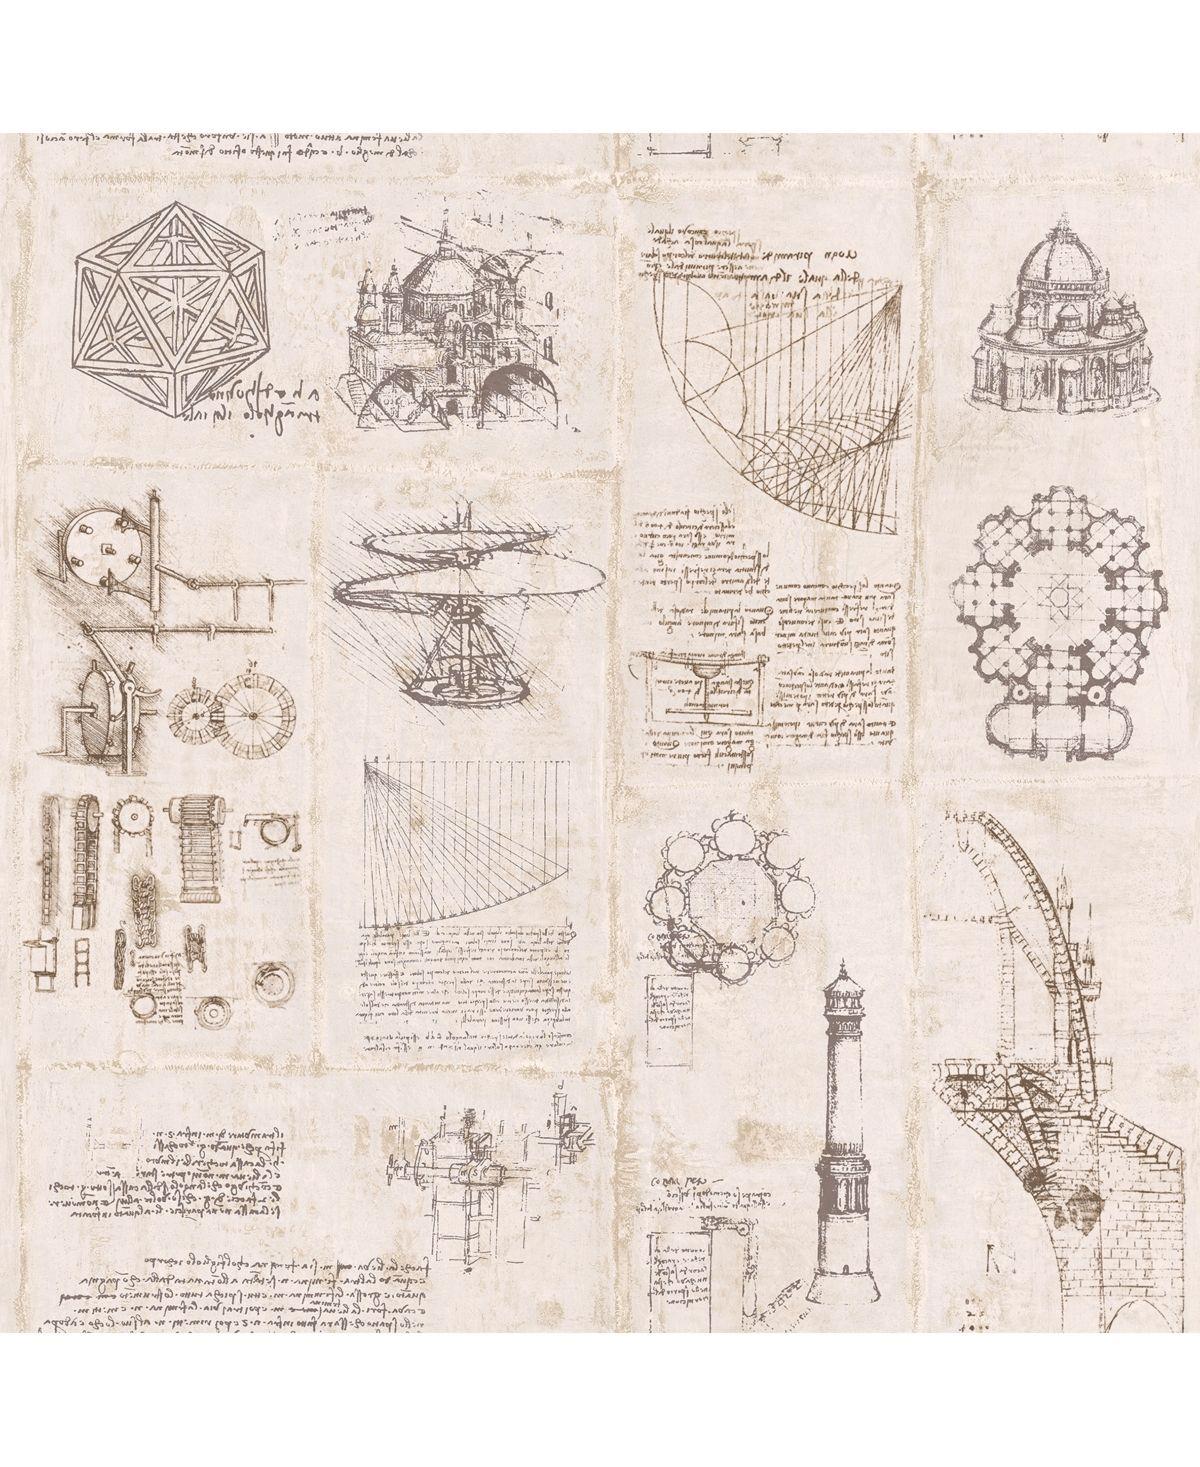 Sirpi 27 X 396 Schizzi Papiro Sketch Wallpaper Amp Reviews